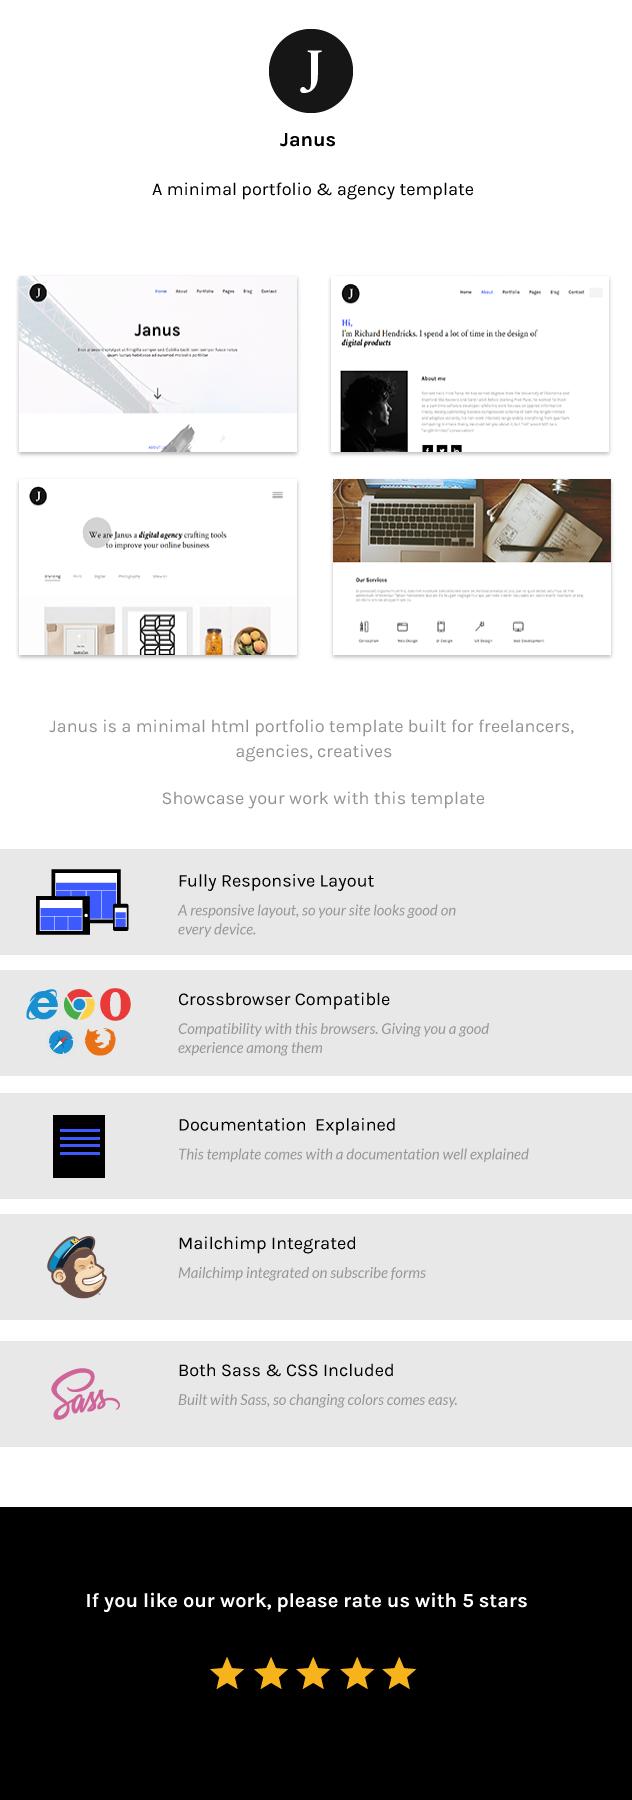 Janus - A minimal portfolio and agency template - 1